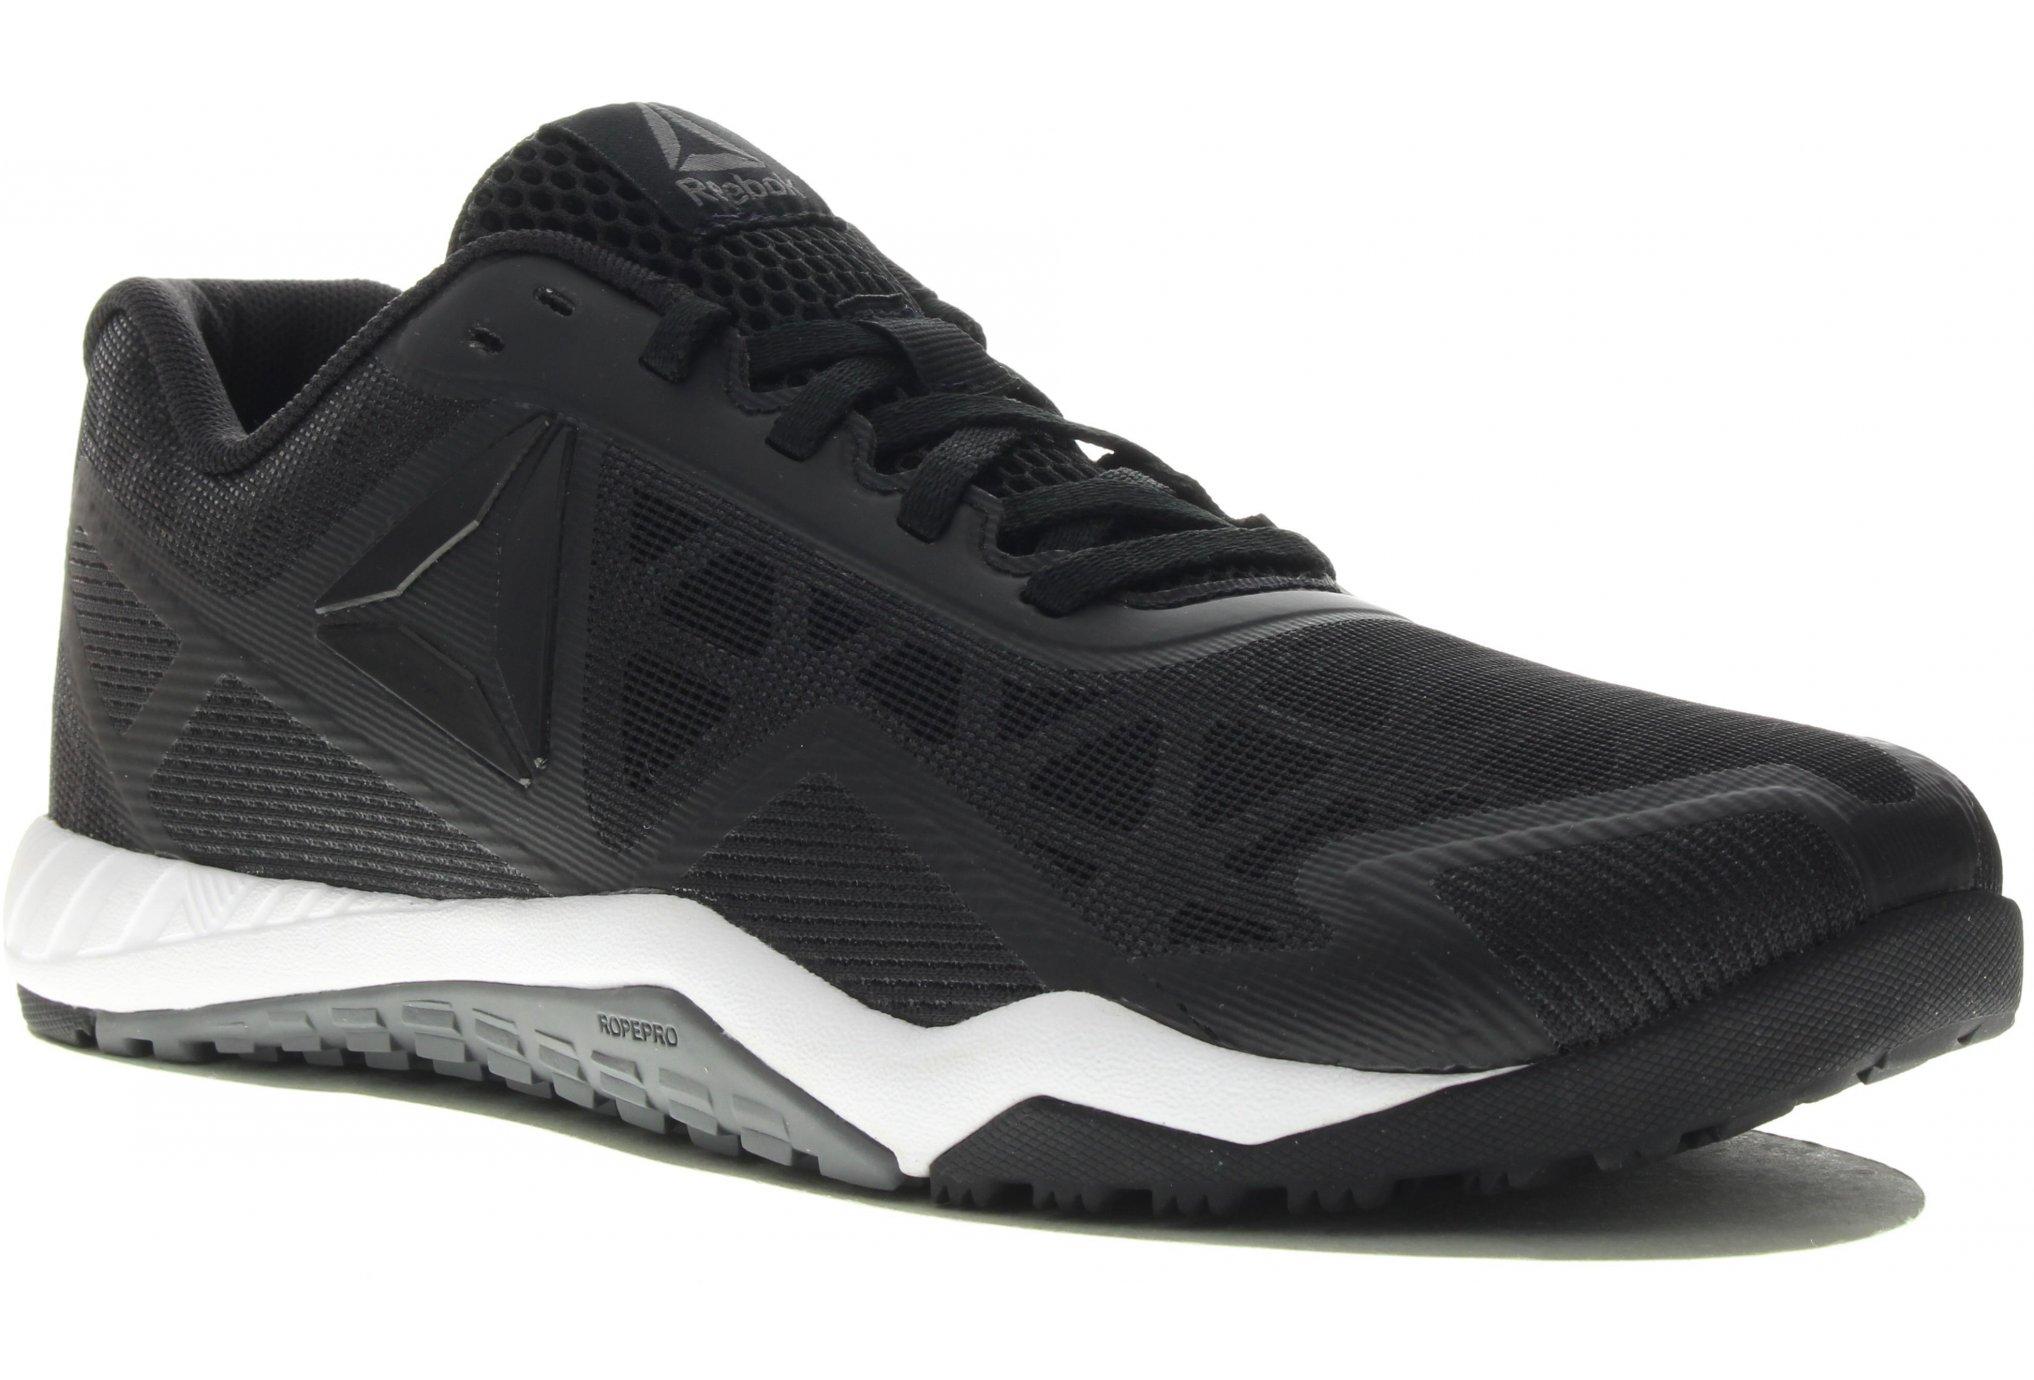 Reebok ROS Workout TR 2.0 W Diététique Chaussures femme